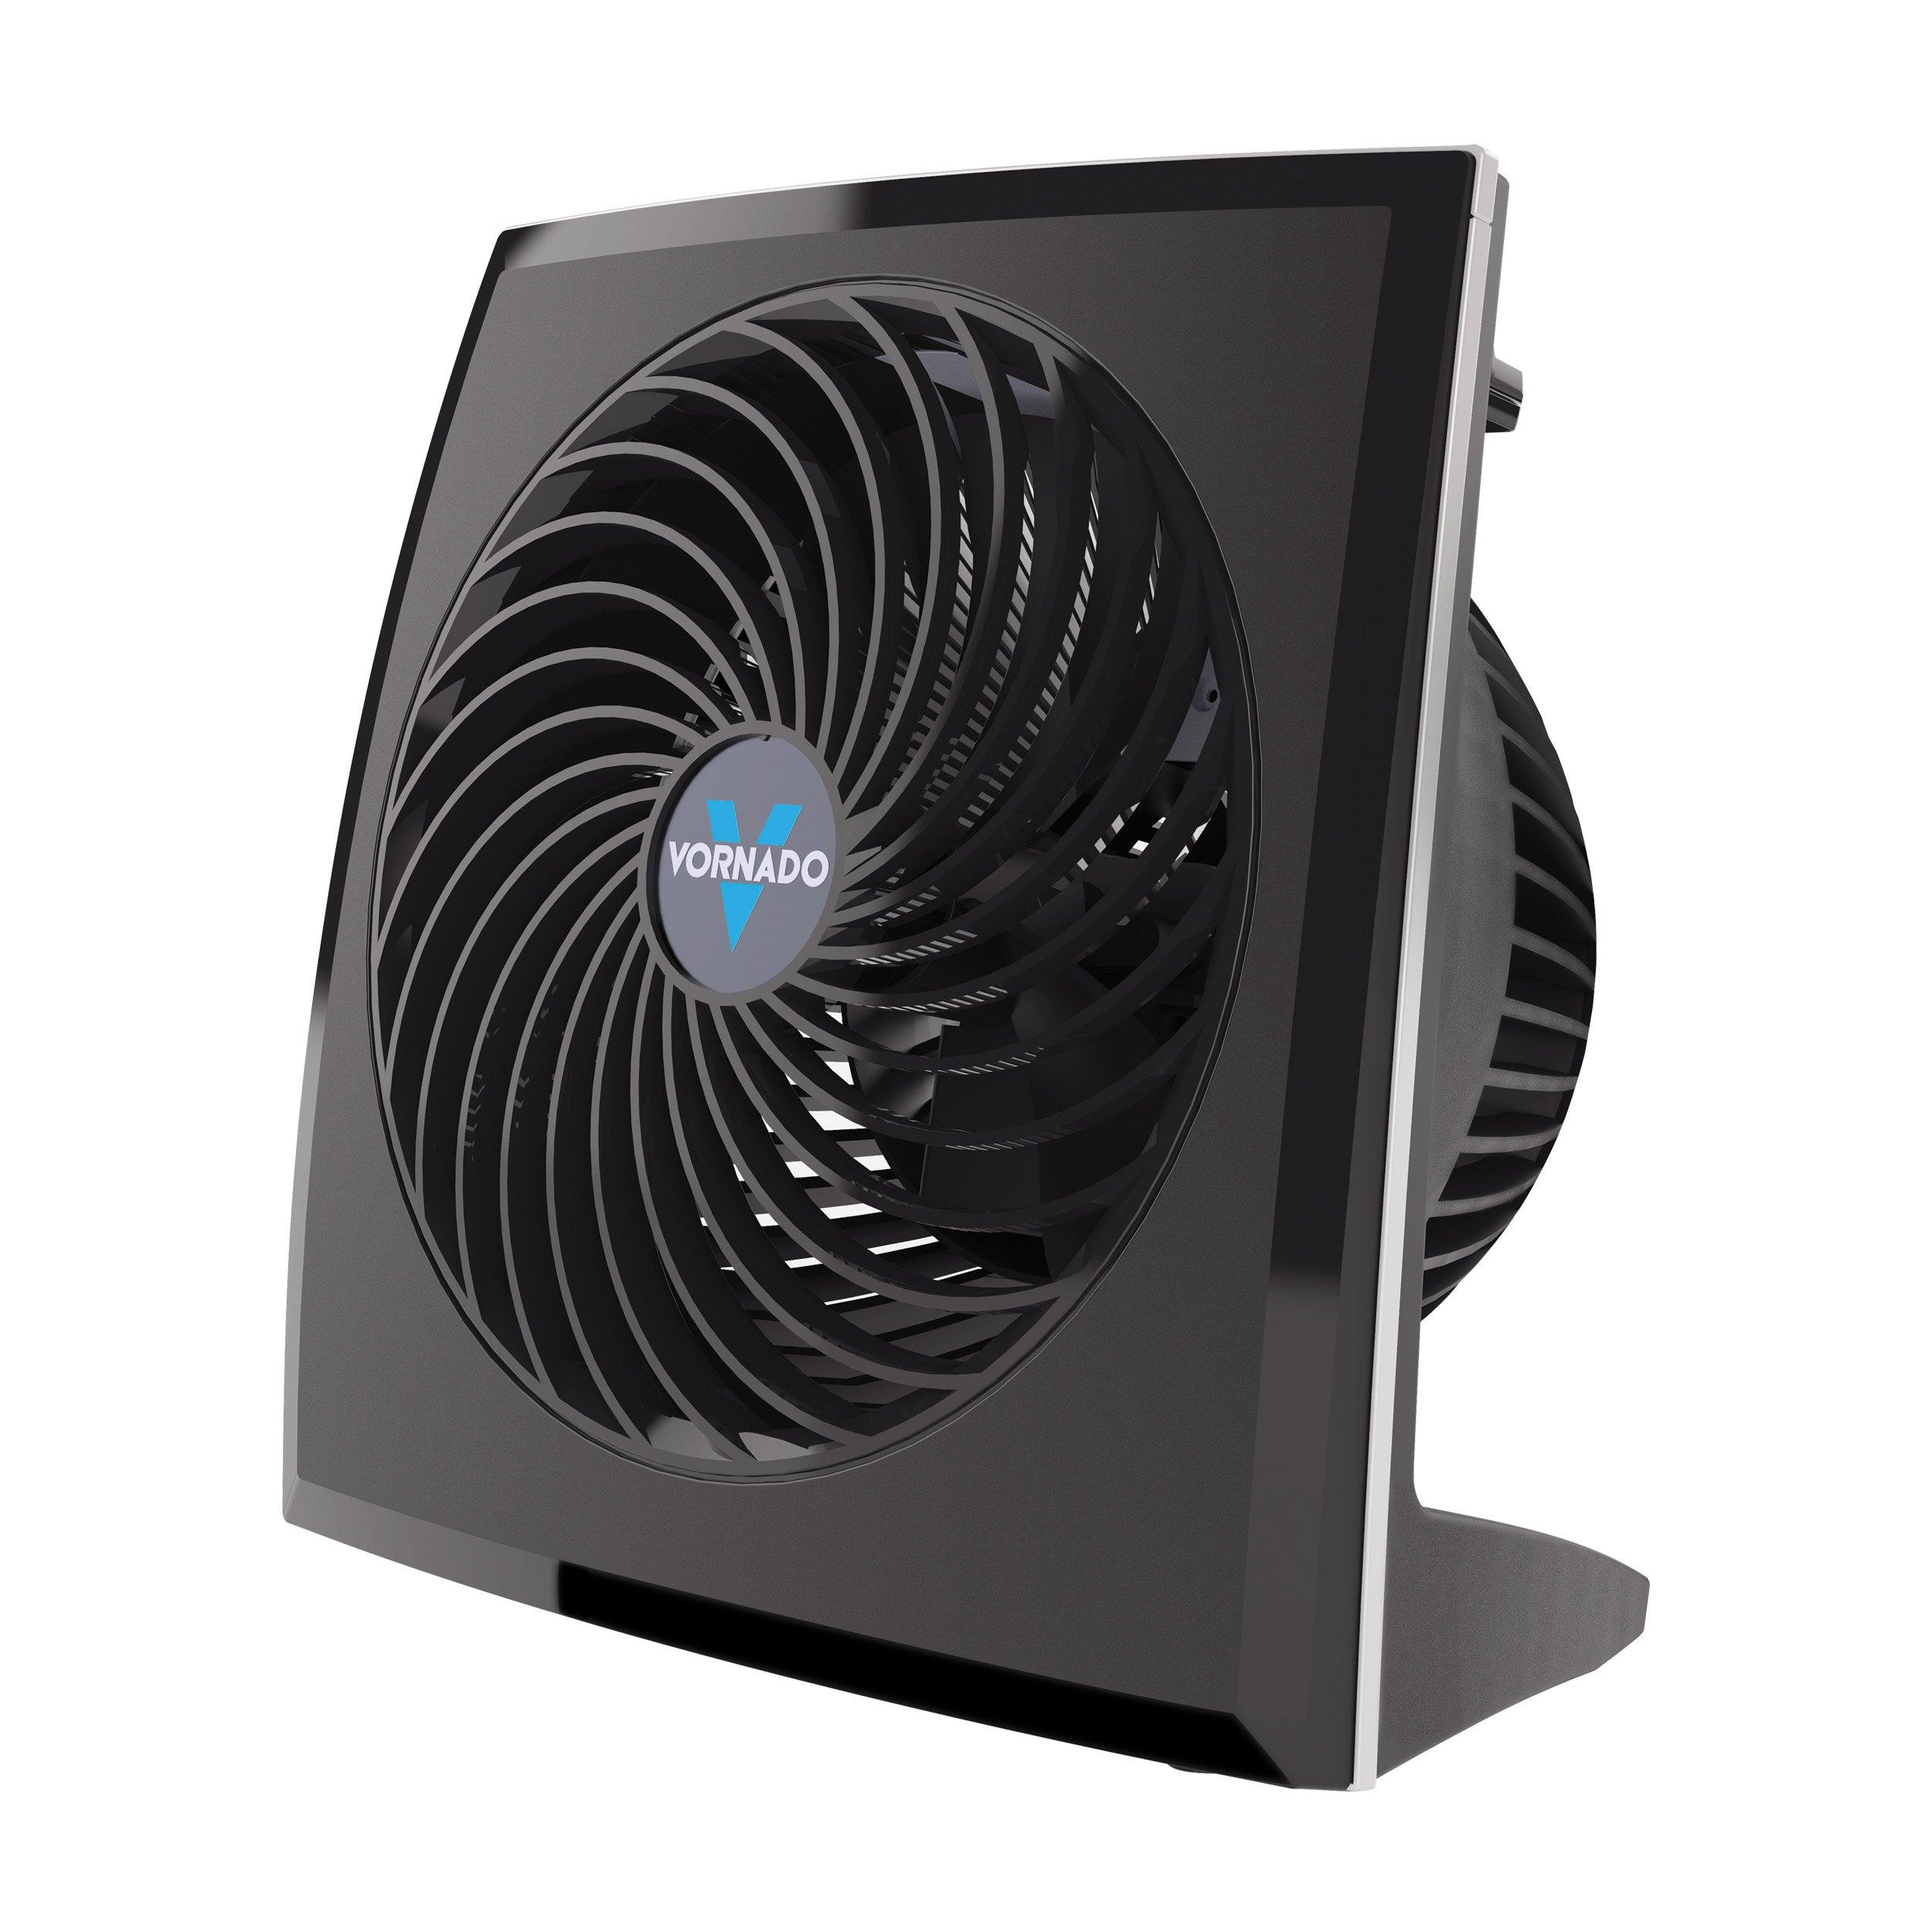 Vornado 573 Small Flat Panel Air Circulator Fan by Vornado